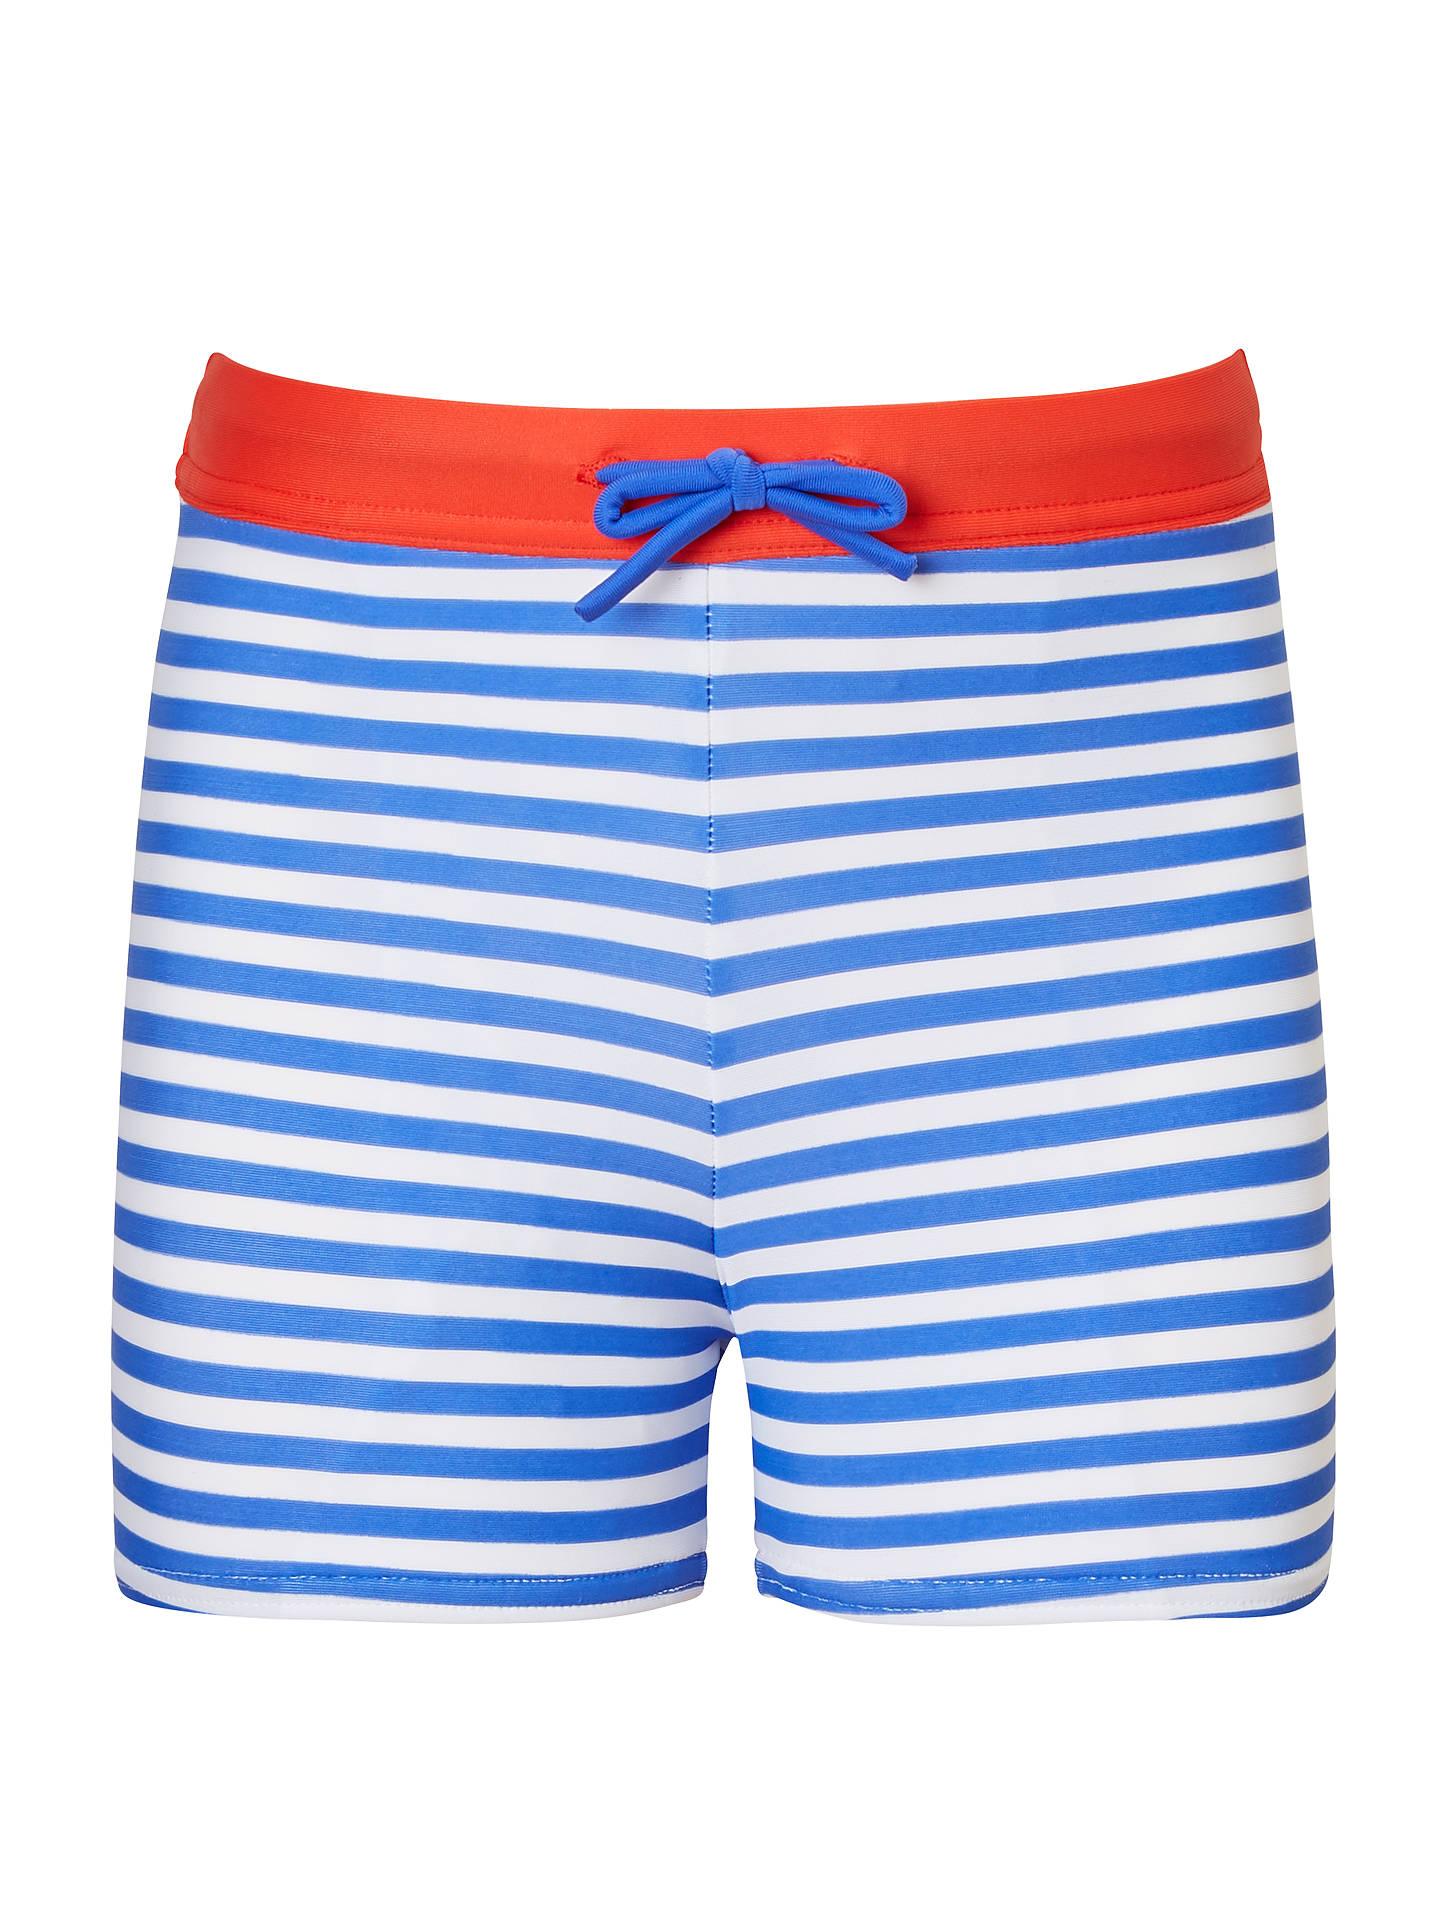 e40063a56 BuyJohn Lewis   Partners Boys  Stripe Printed Swimming Trunks